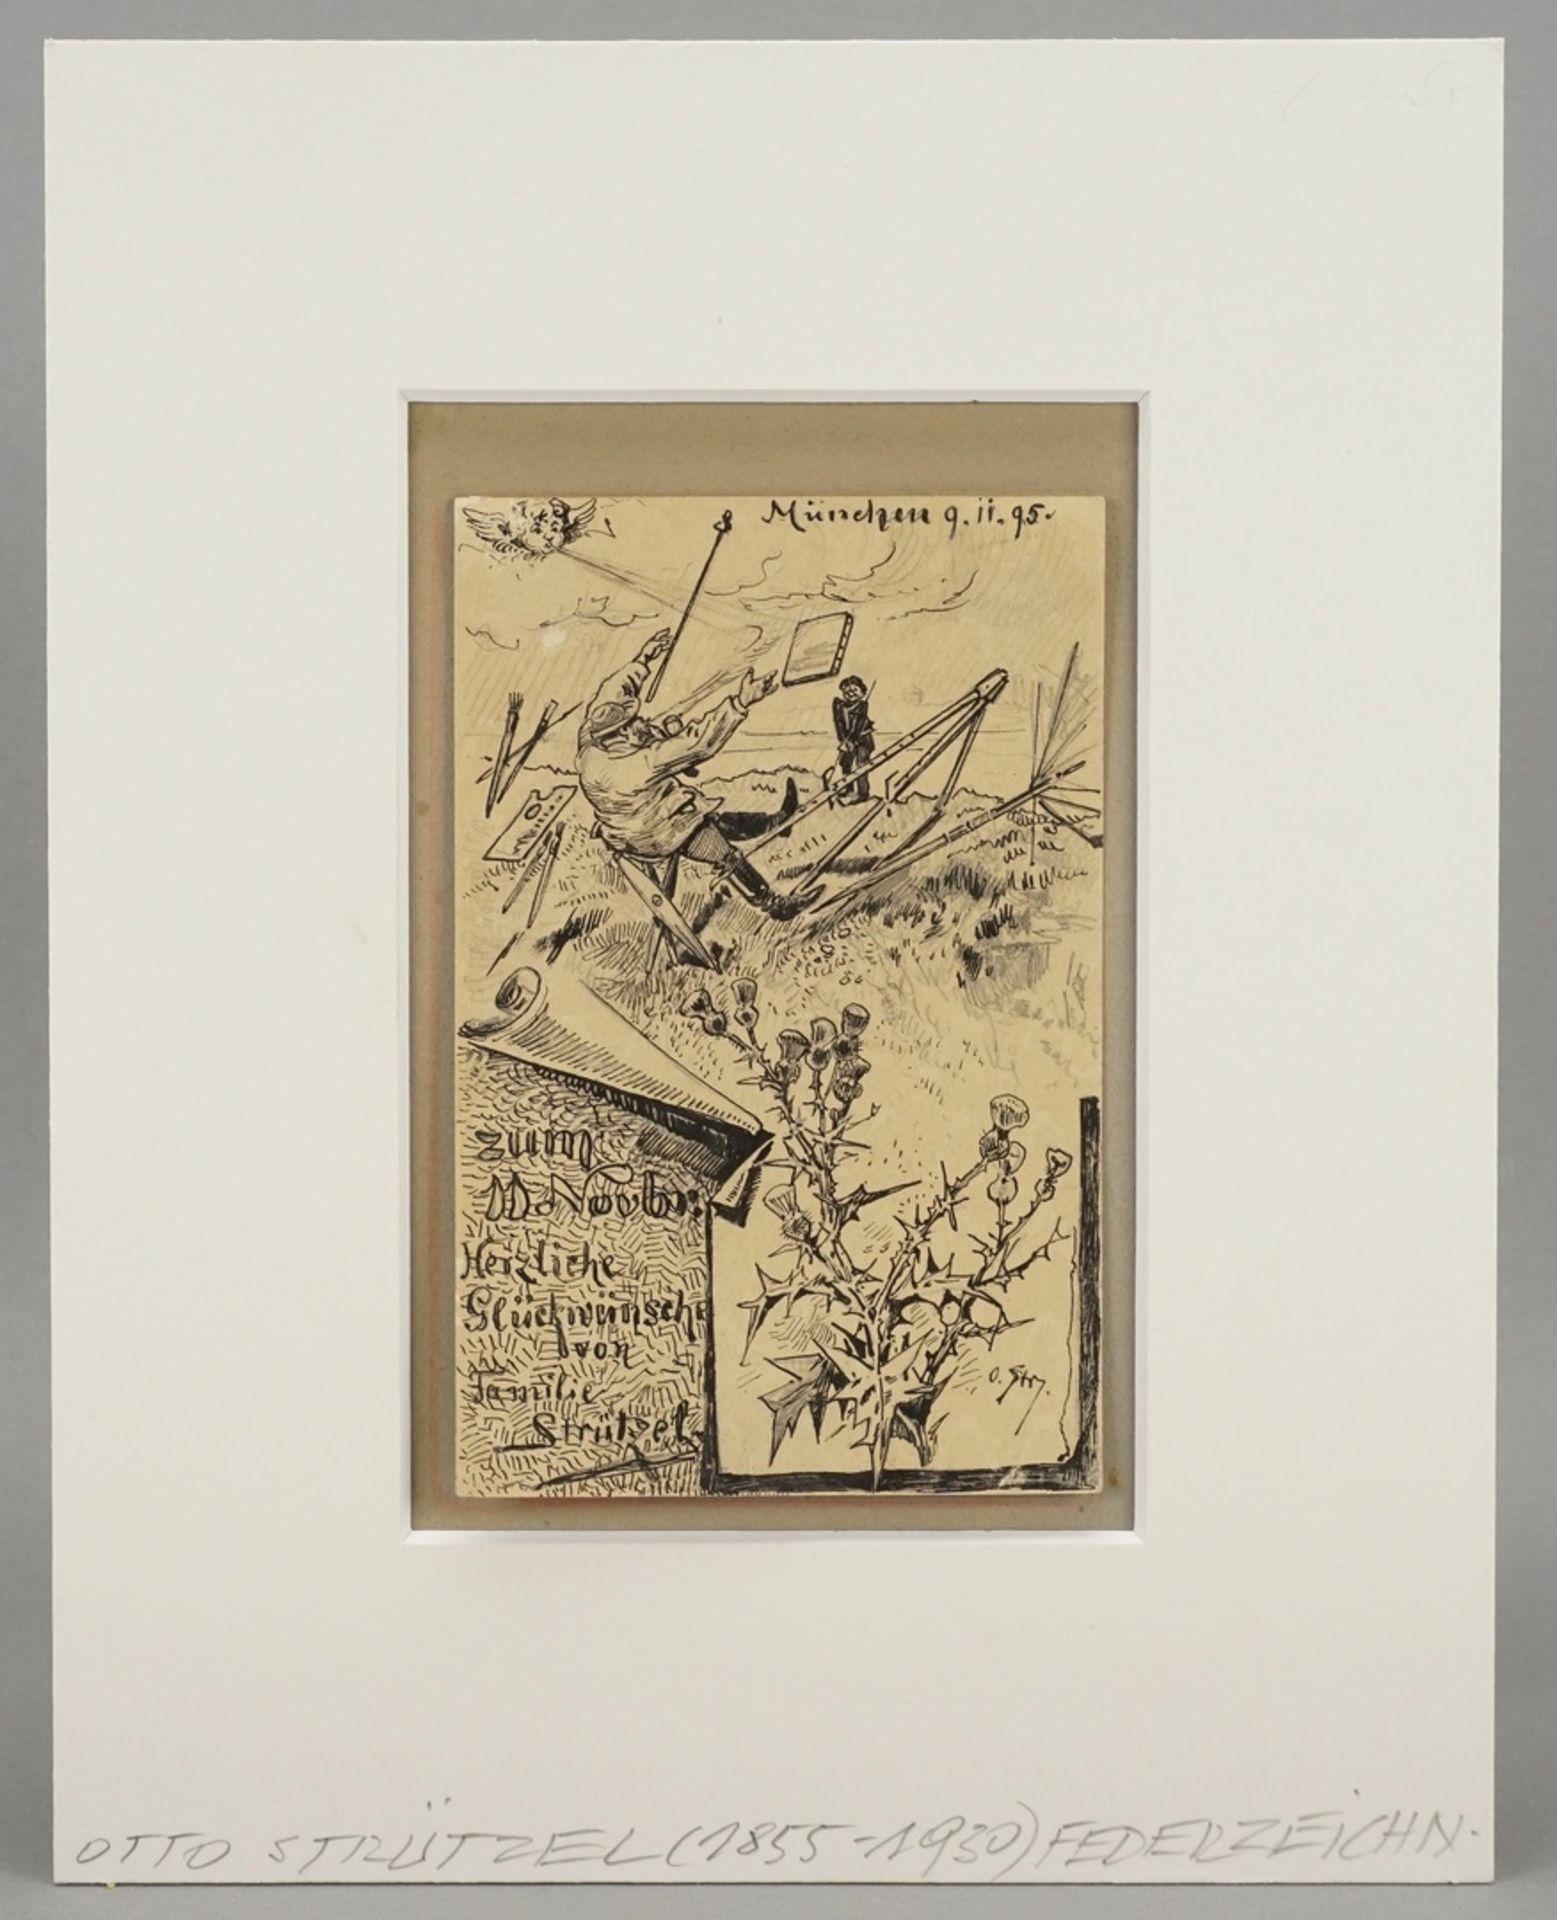 Leopold Otto Strützel, Glückwunschkarte - Bild 2 aus 4